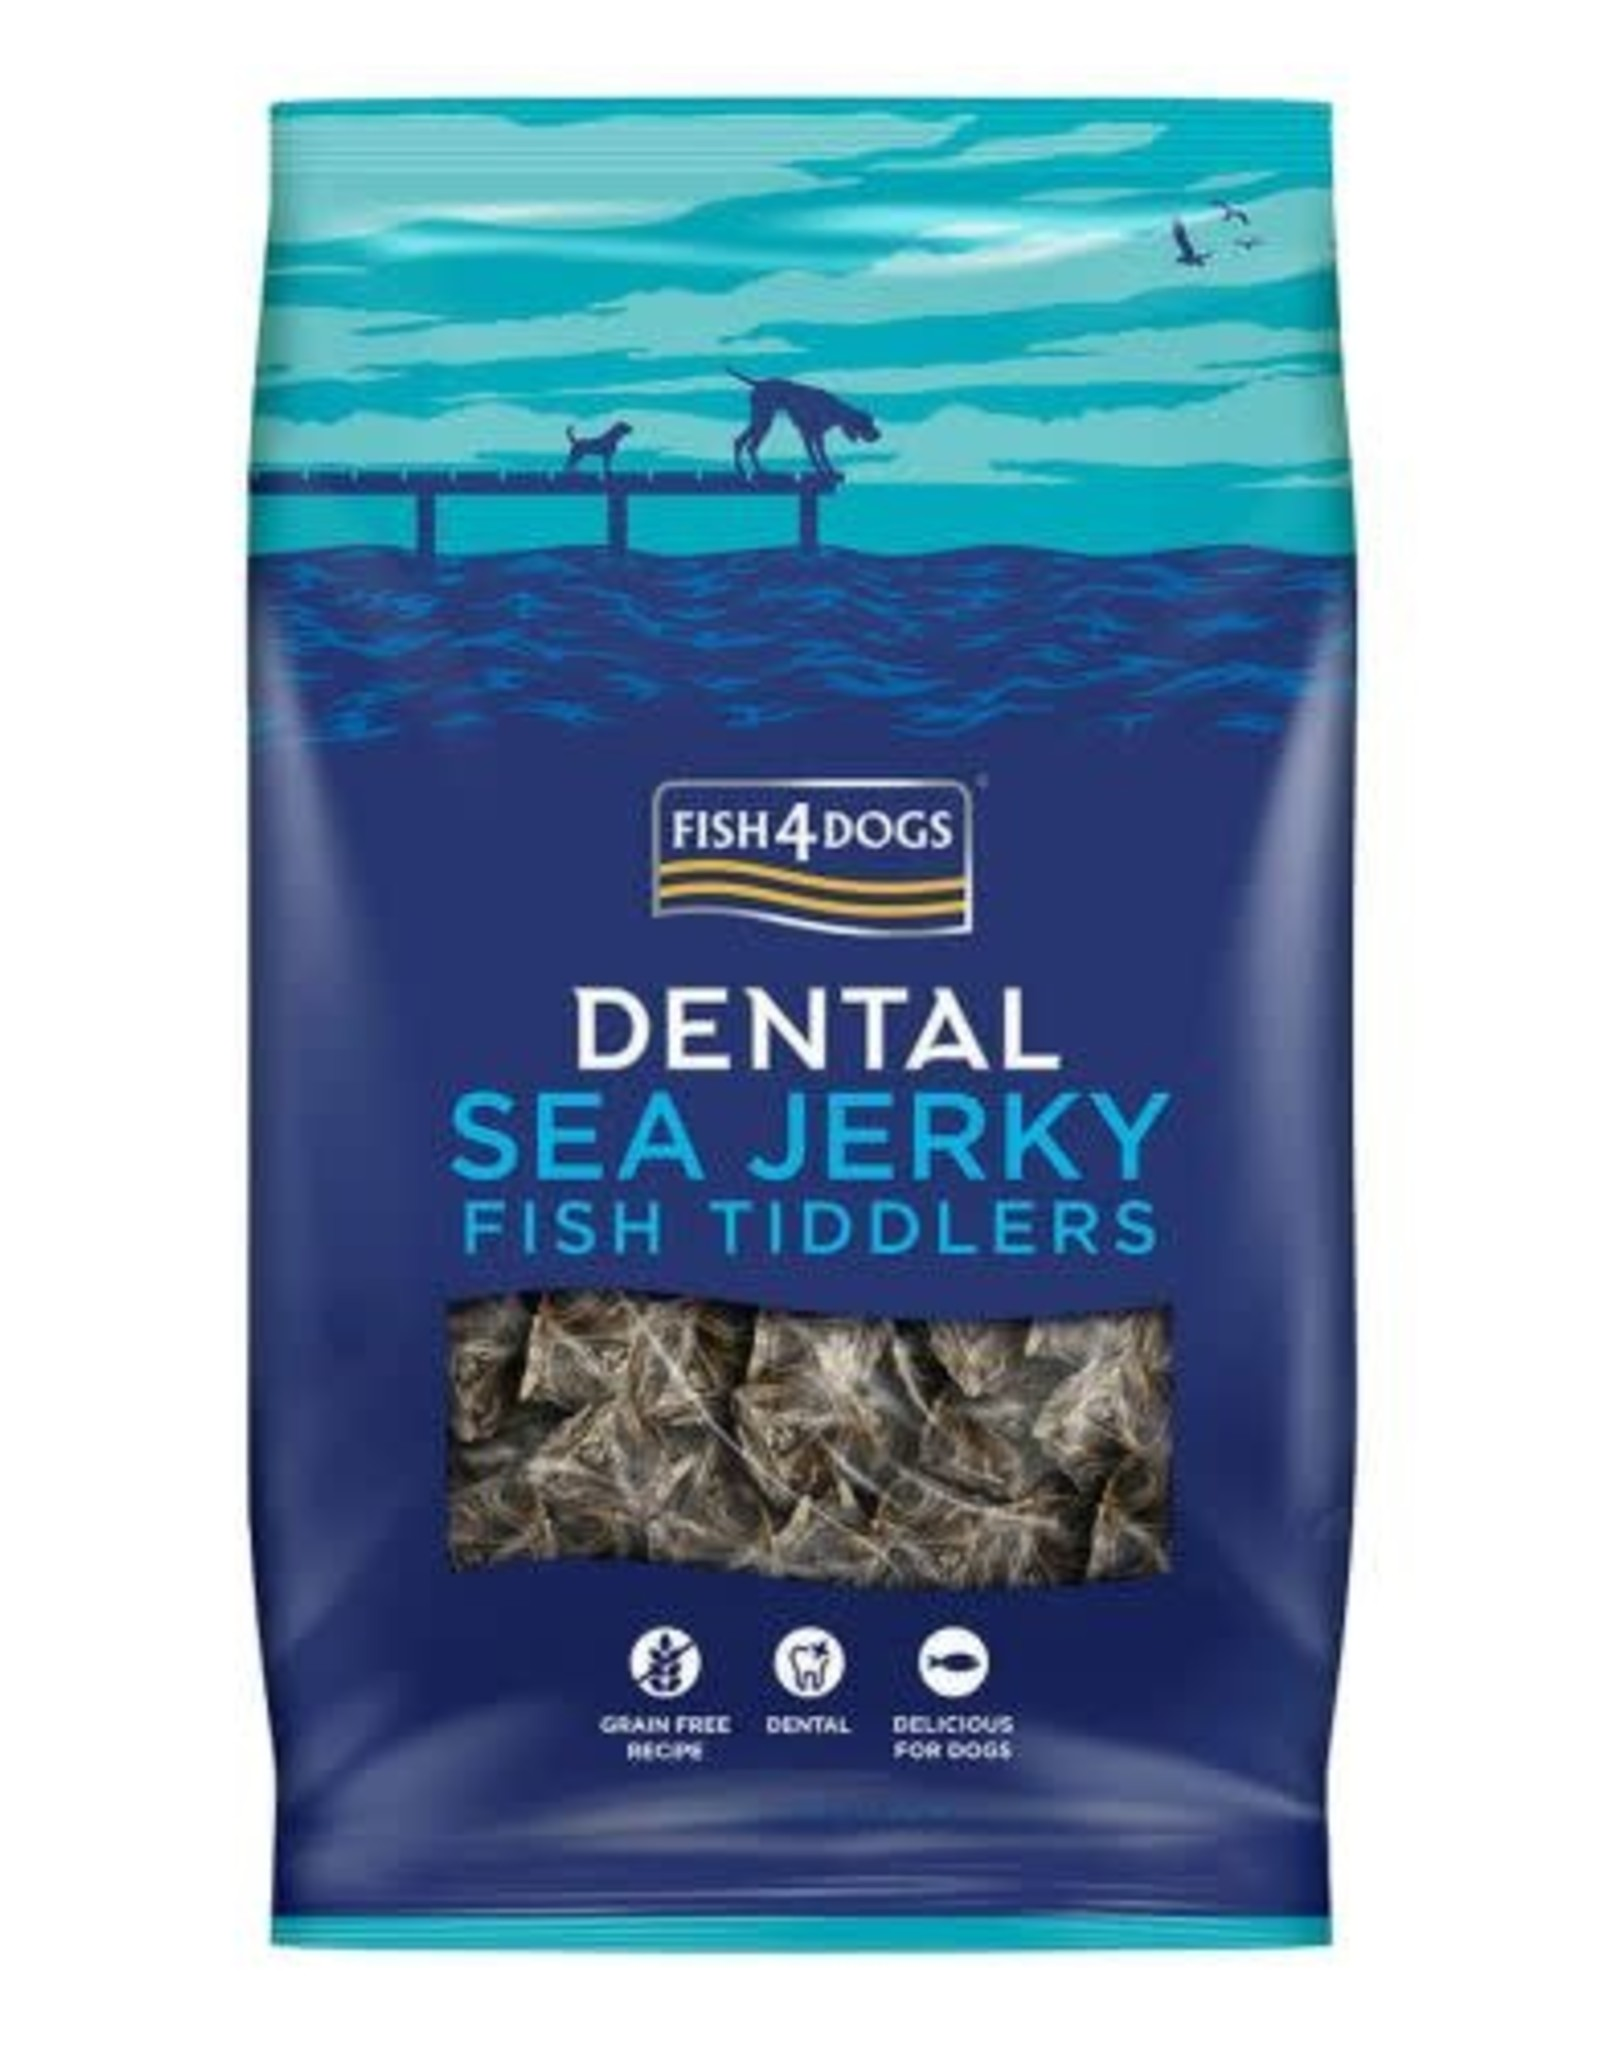 Fish4Dogs Dental Sea Jerky Fish Tiddlers Dog Treats, 115g